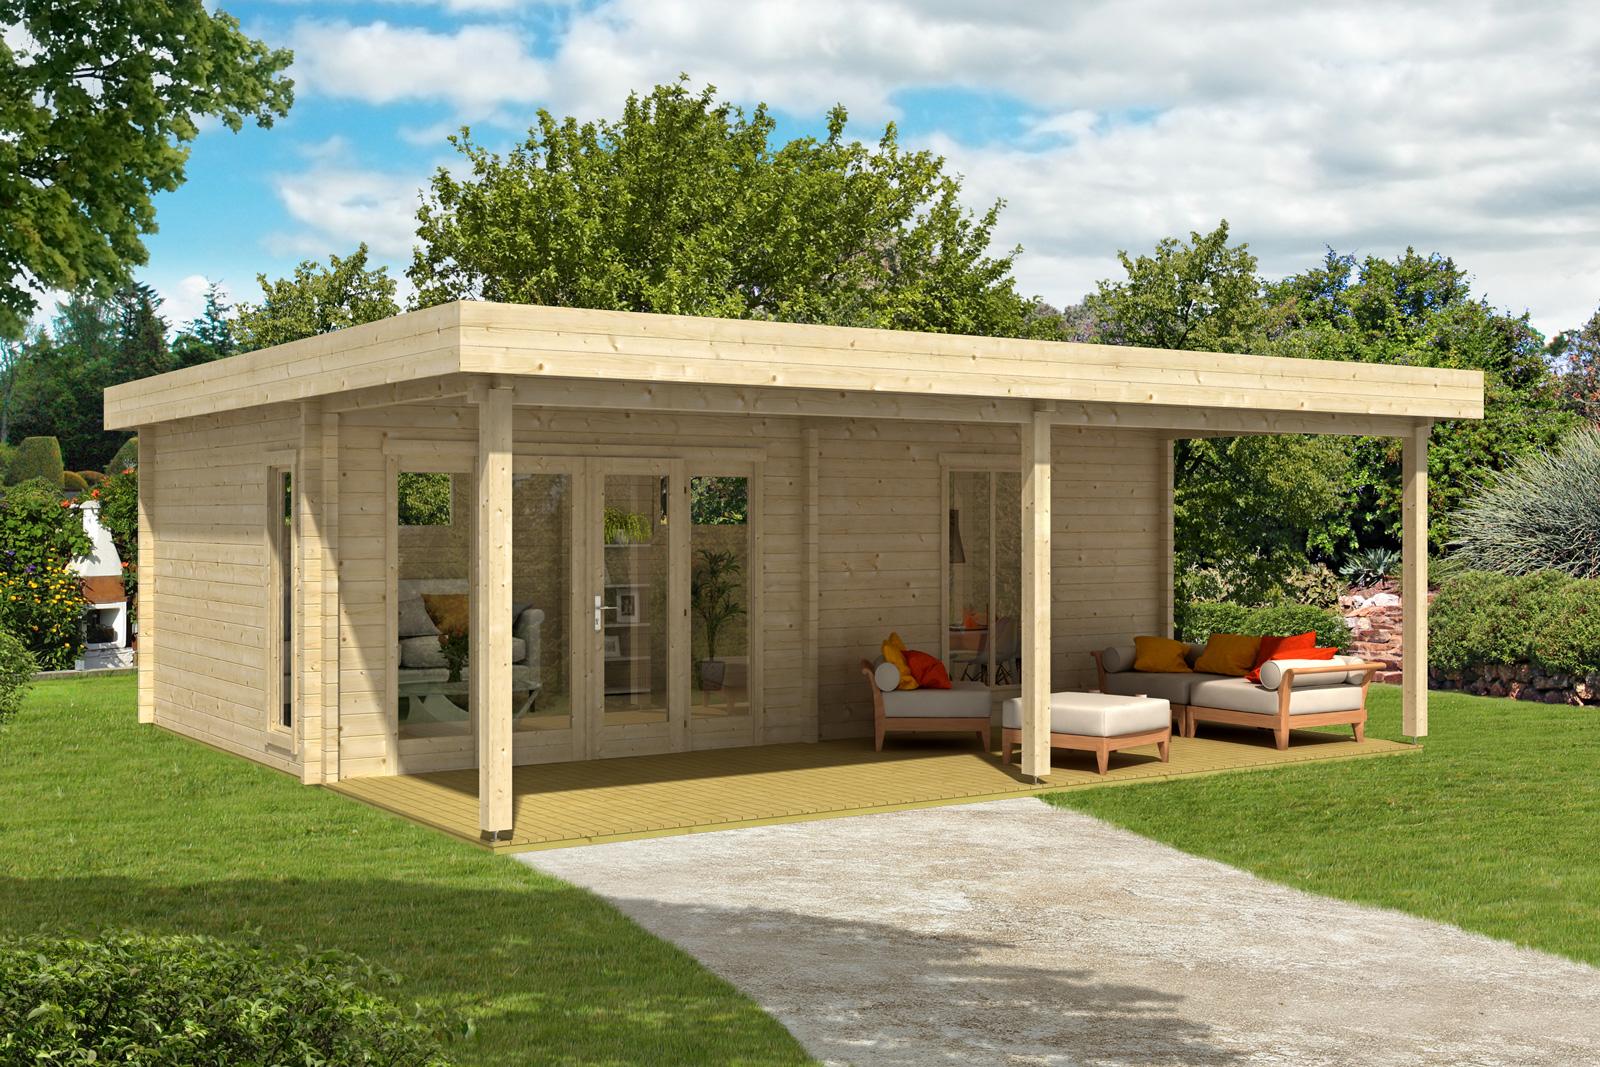 carlsson gartenhaus bendix iso. Black Bedroom Furniture Sets. Home Design Ideas